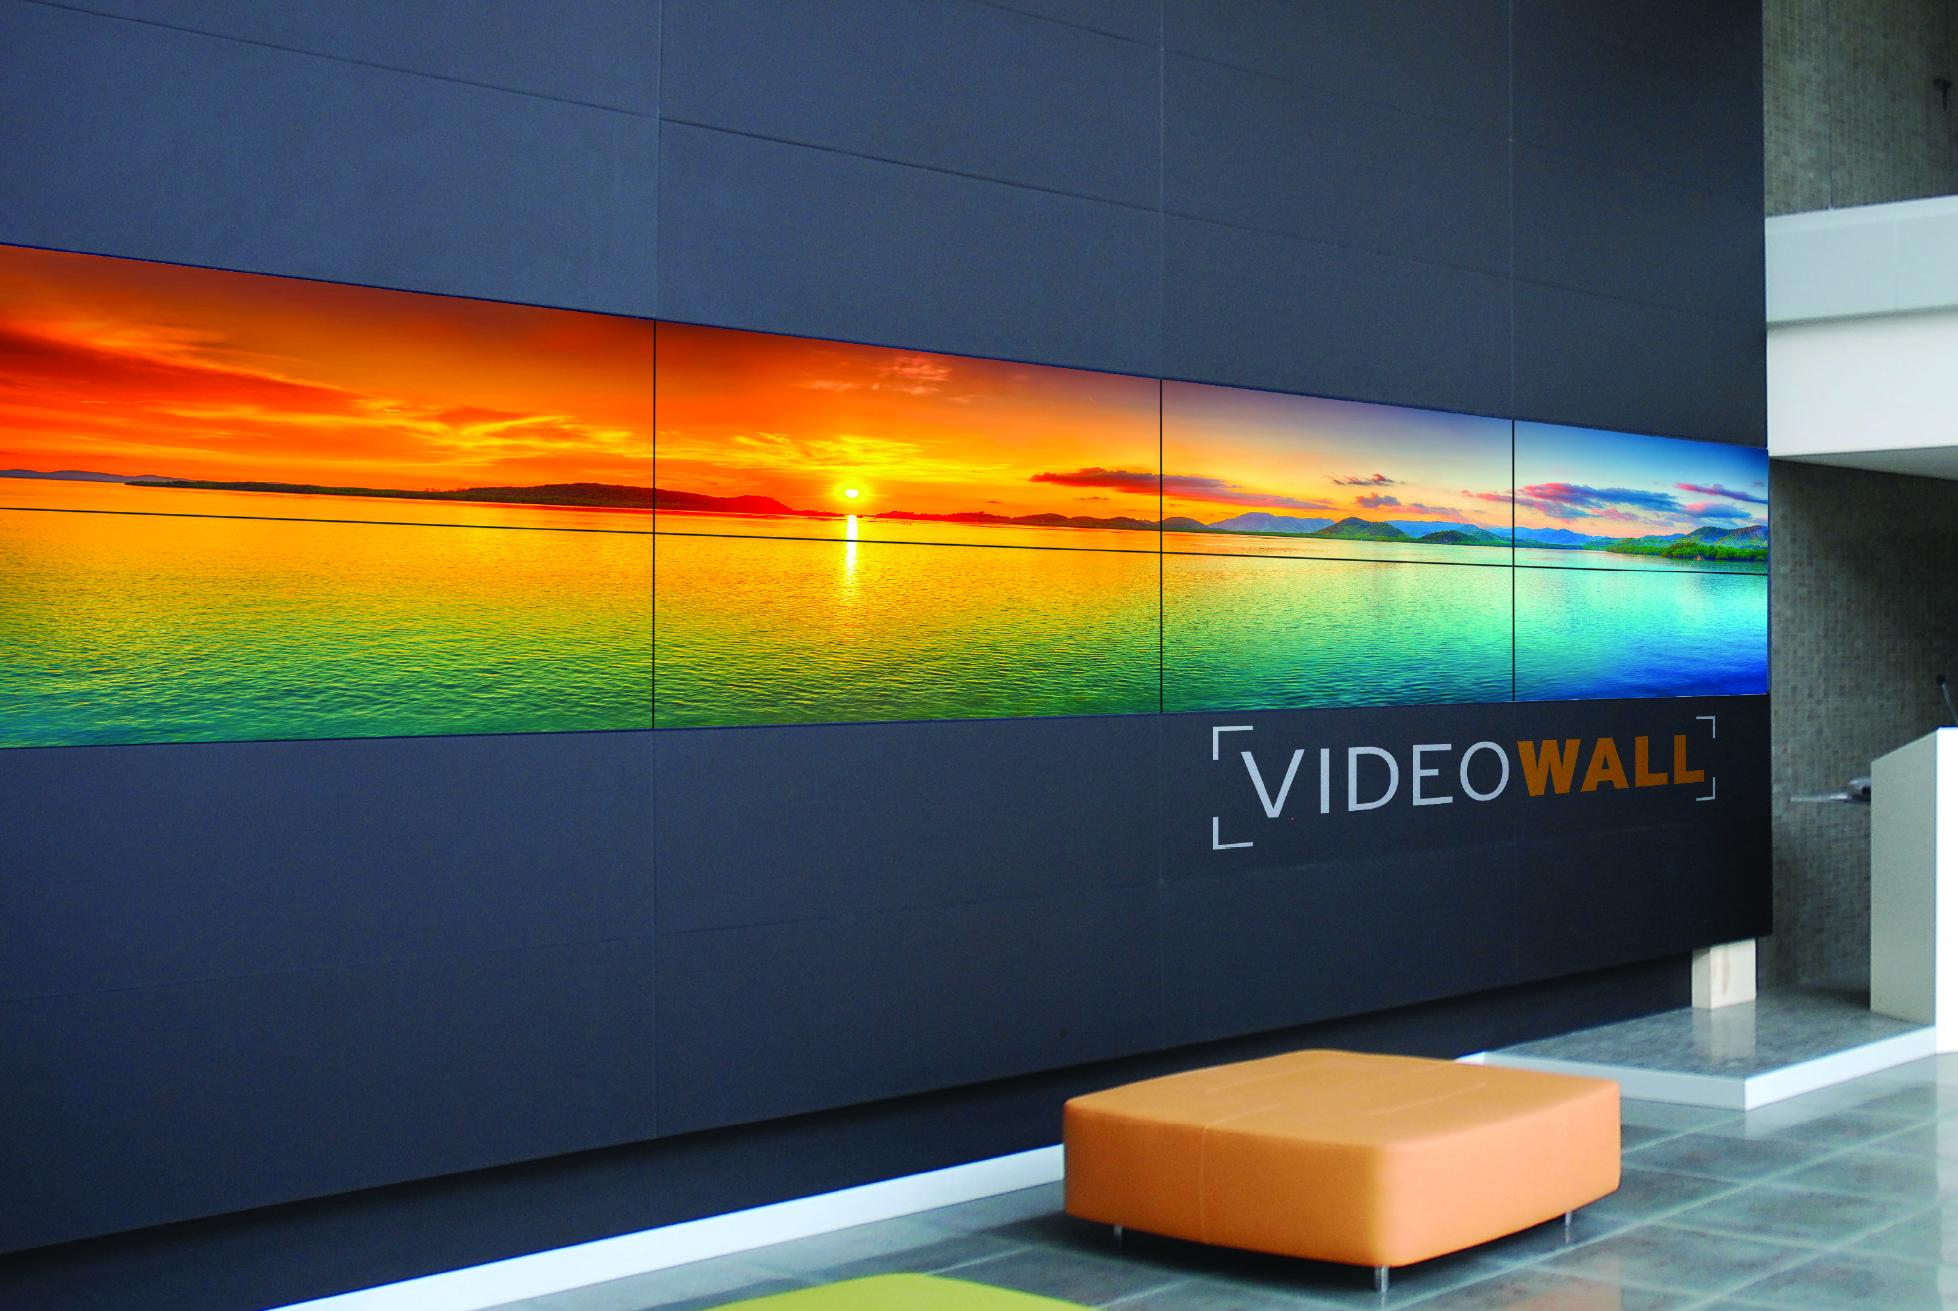 ویدئو وال – ویدیو وال ( Video Wall )